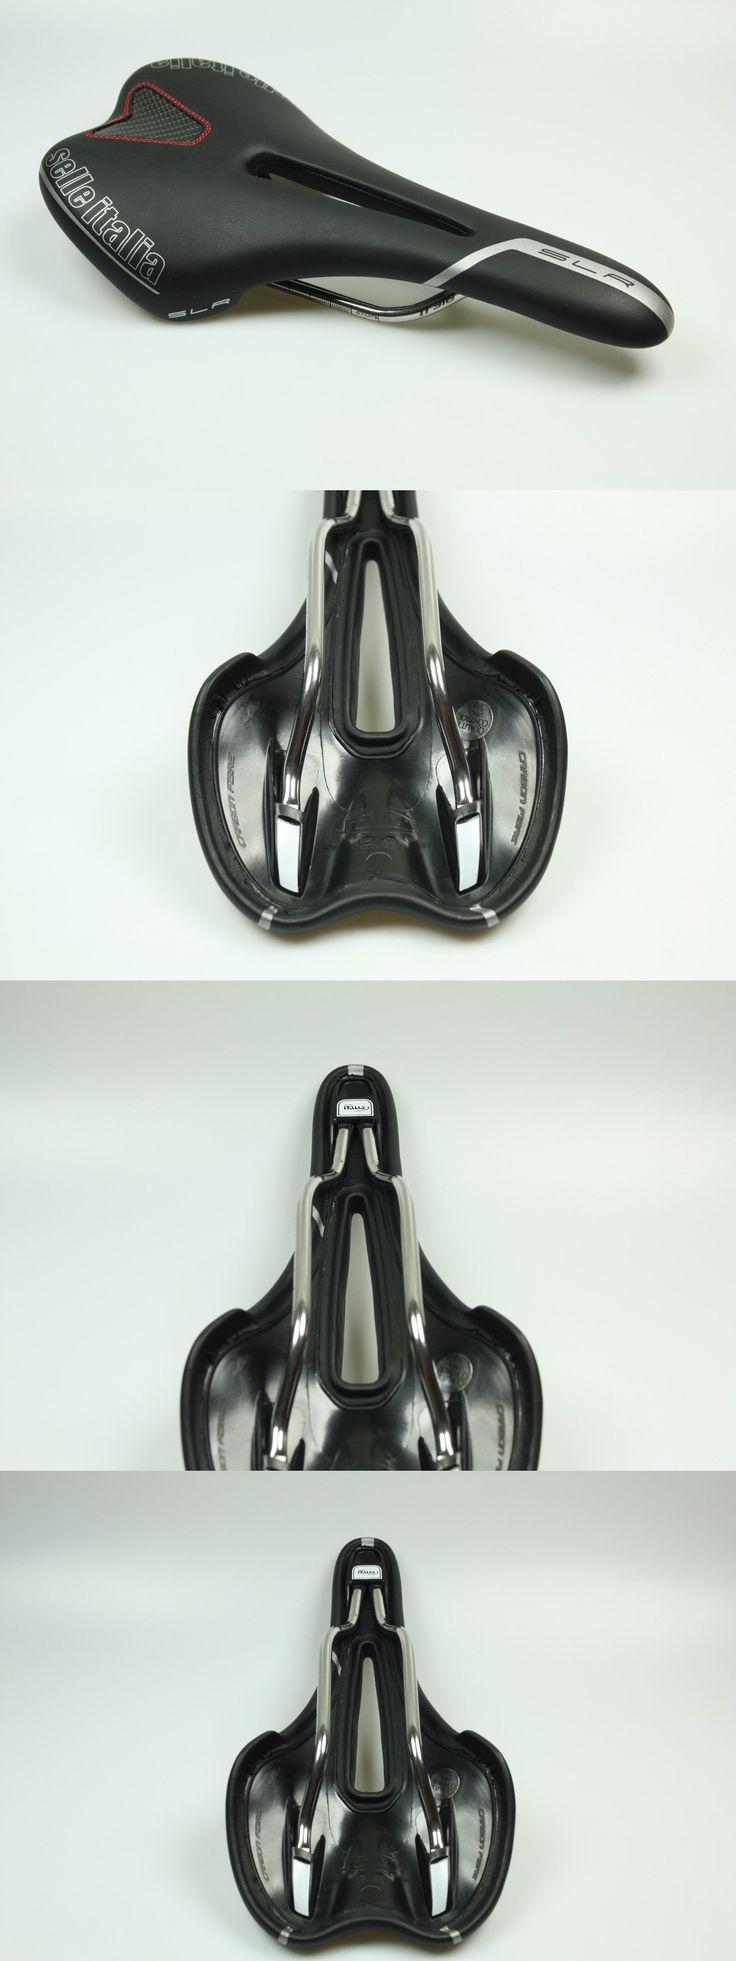 Saddles Seats 177822: Selle Italia Bicycle Saddle Slr Flow Titanium - Black - 215G -> BUY IT NOW ONLY: $89.94 on eBay!